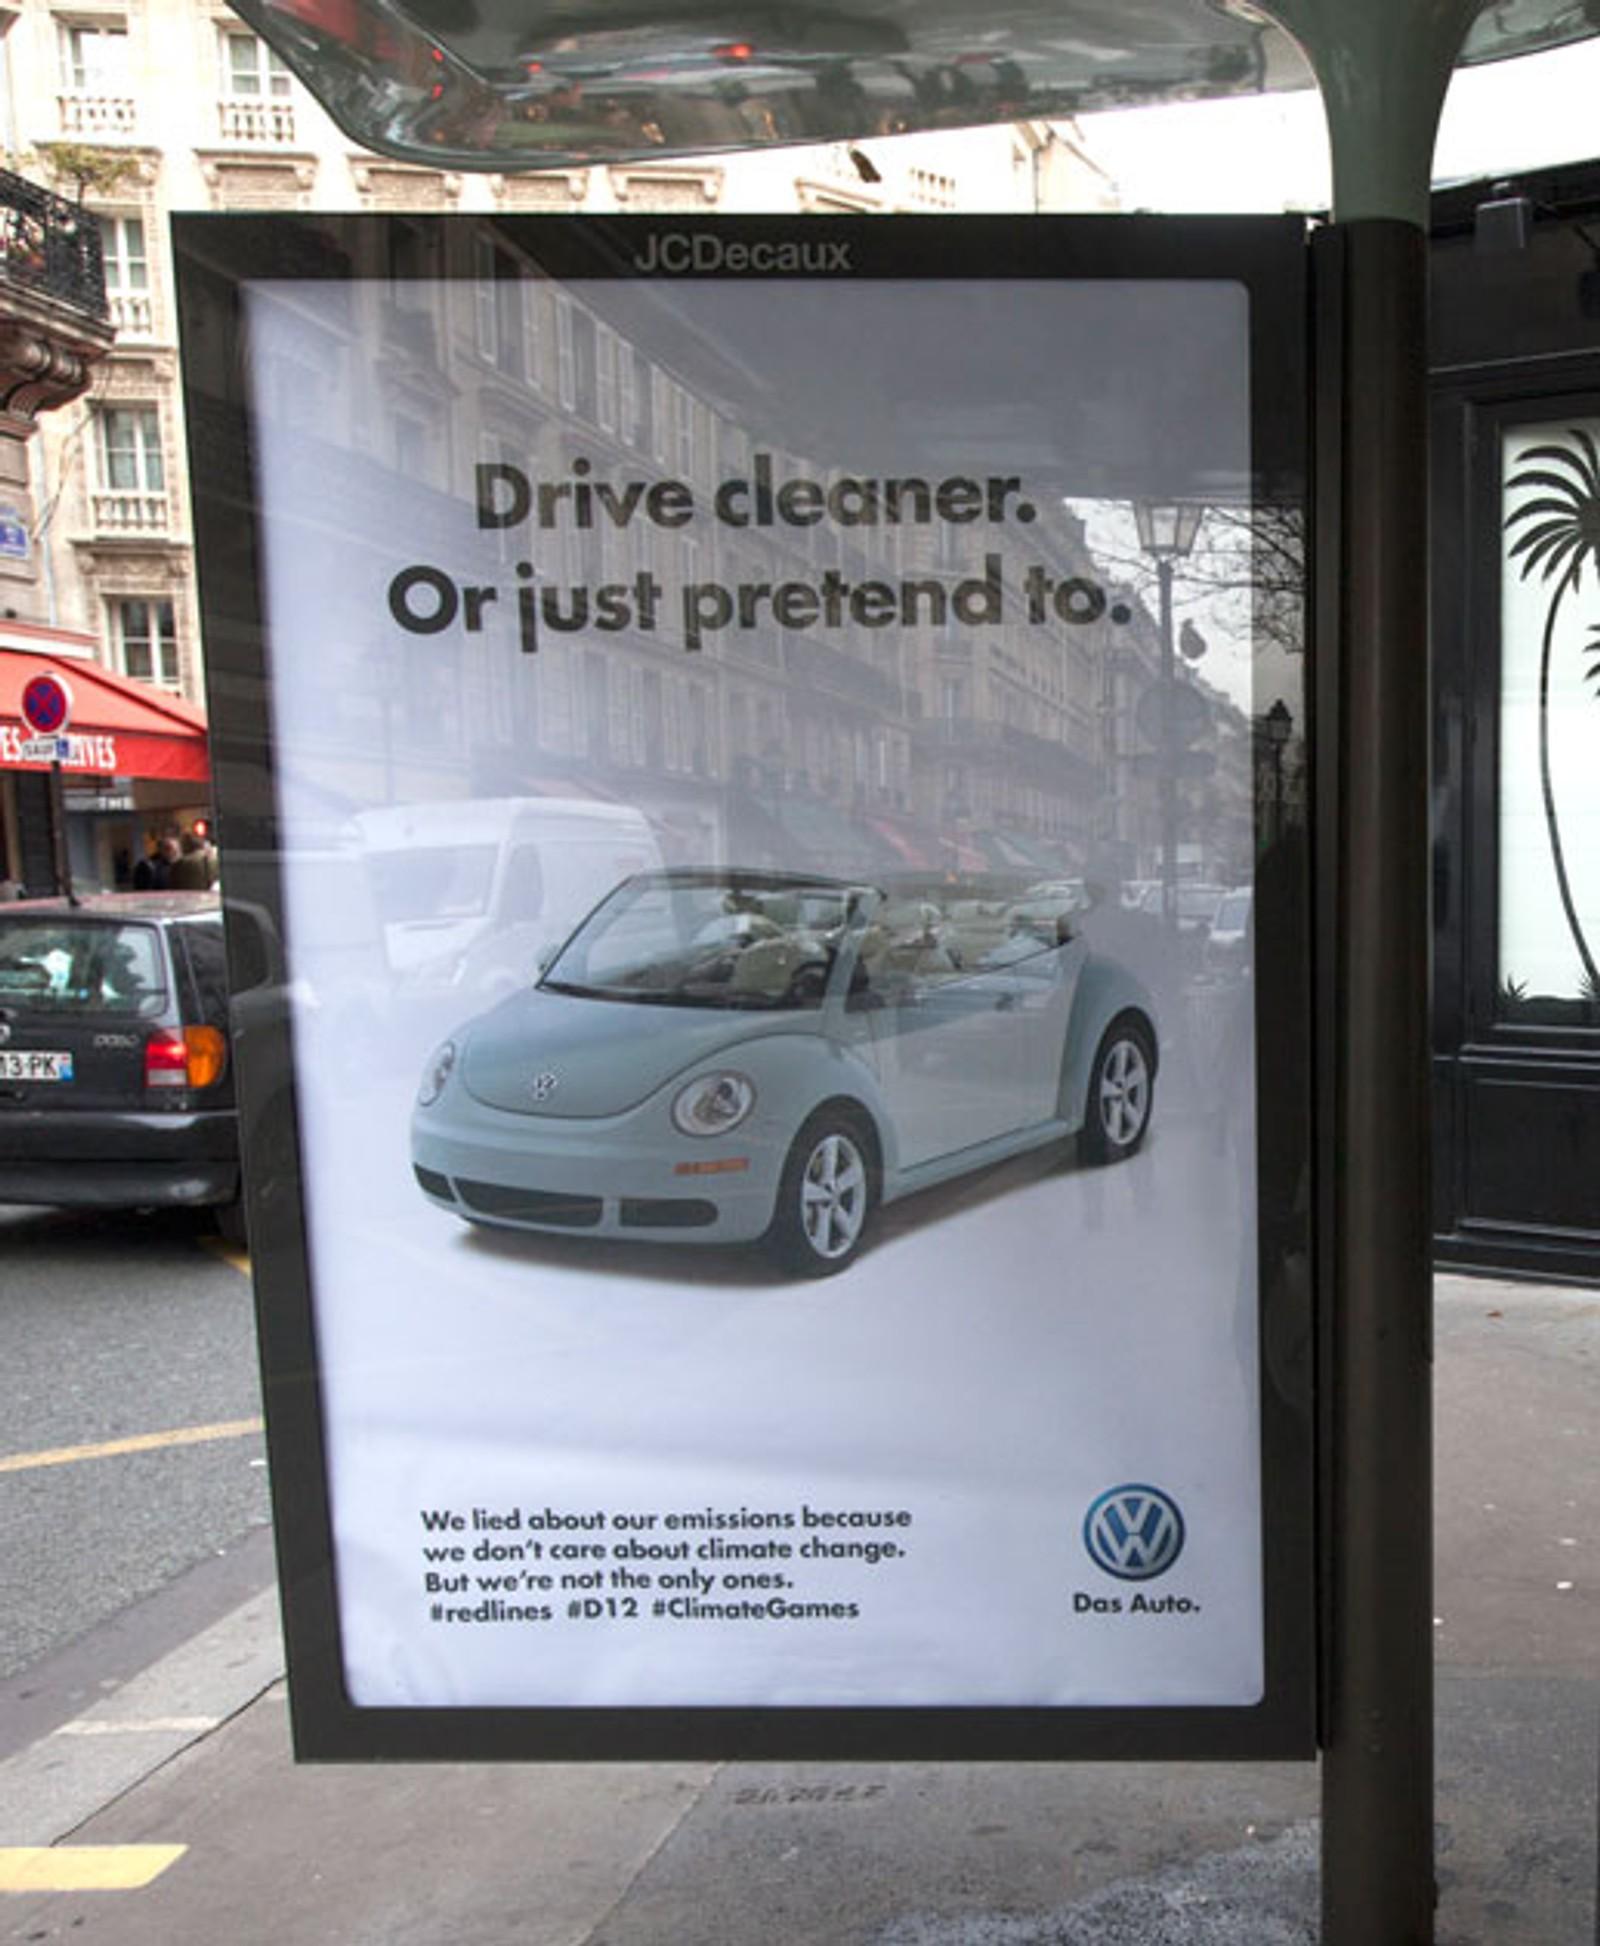 STIKK: Dette stikket fra Brandalism til Volkswagen kan sees i Paris' gater under klimaforhandlingene.